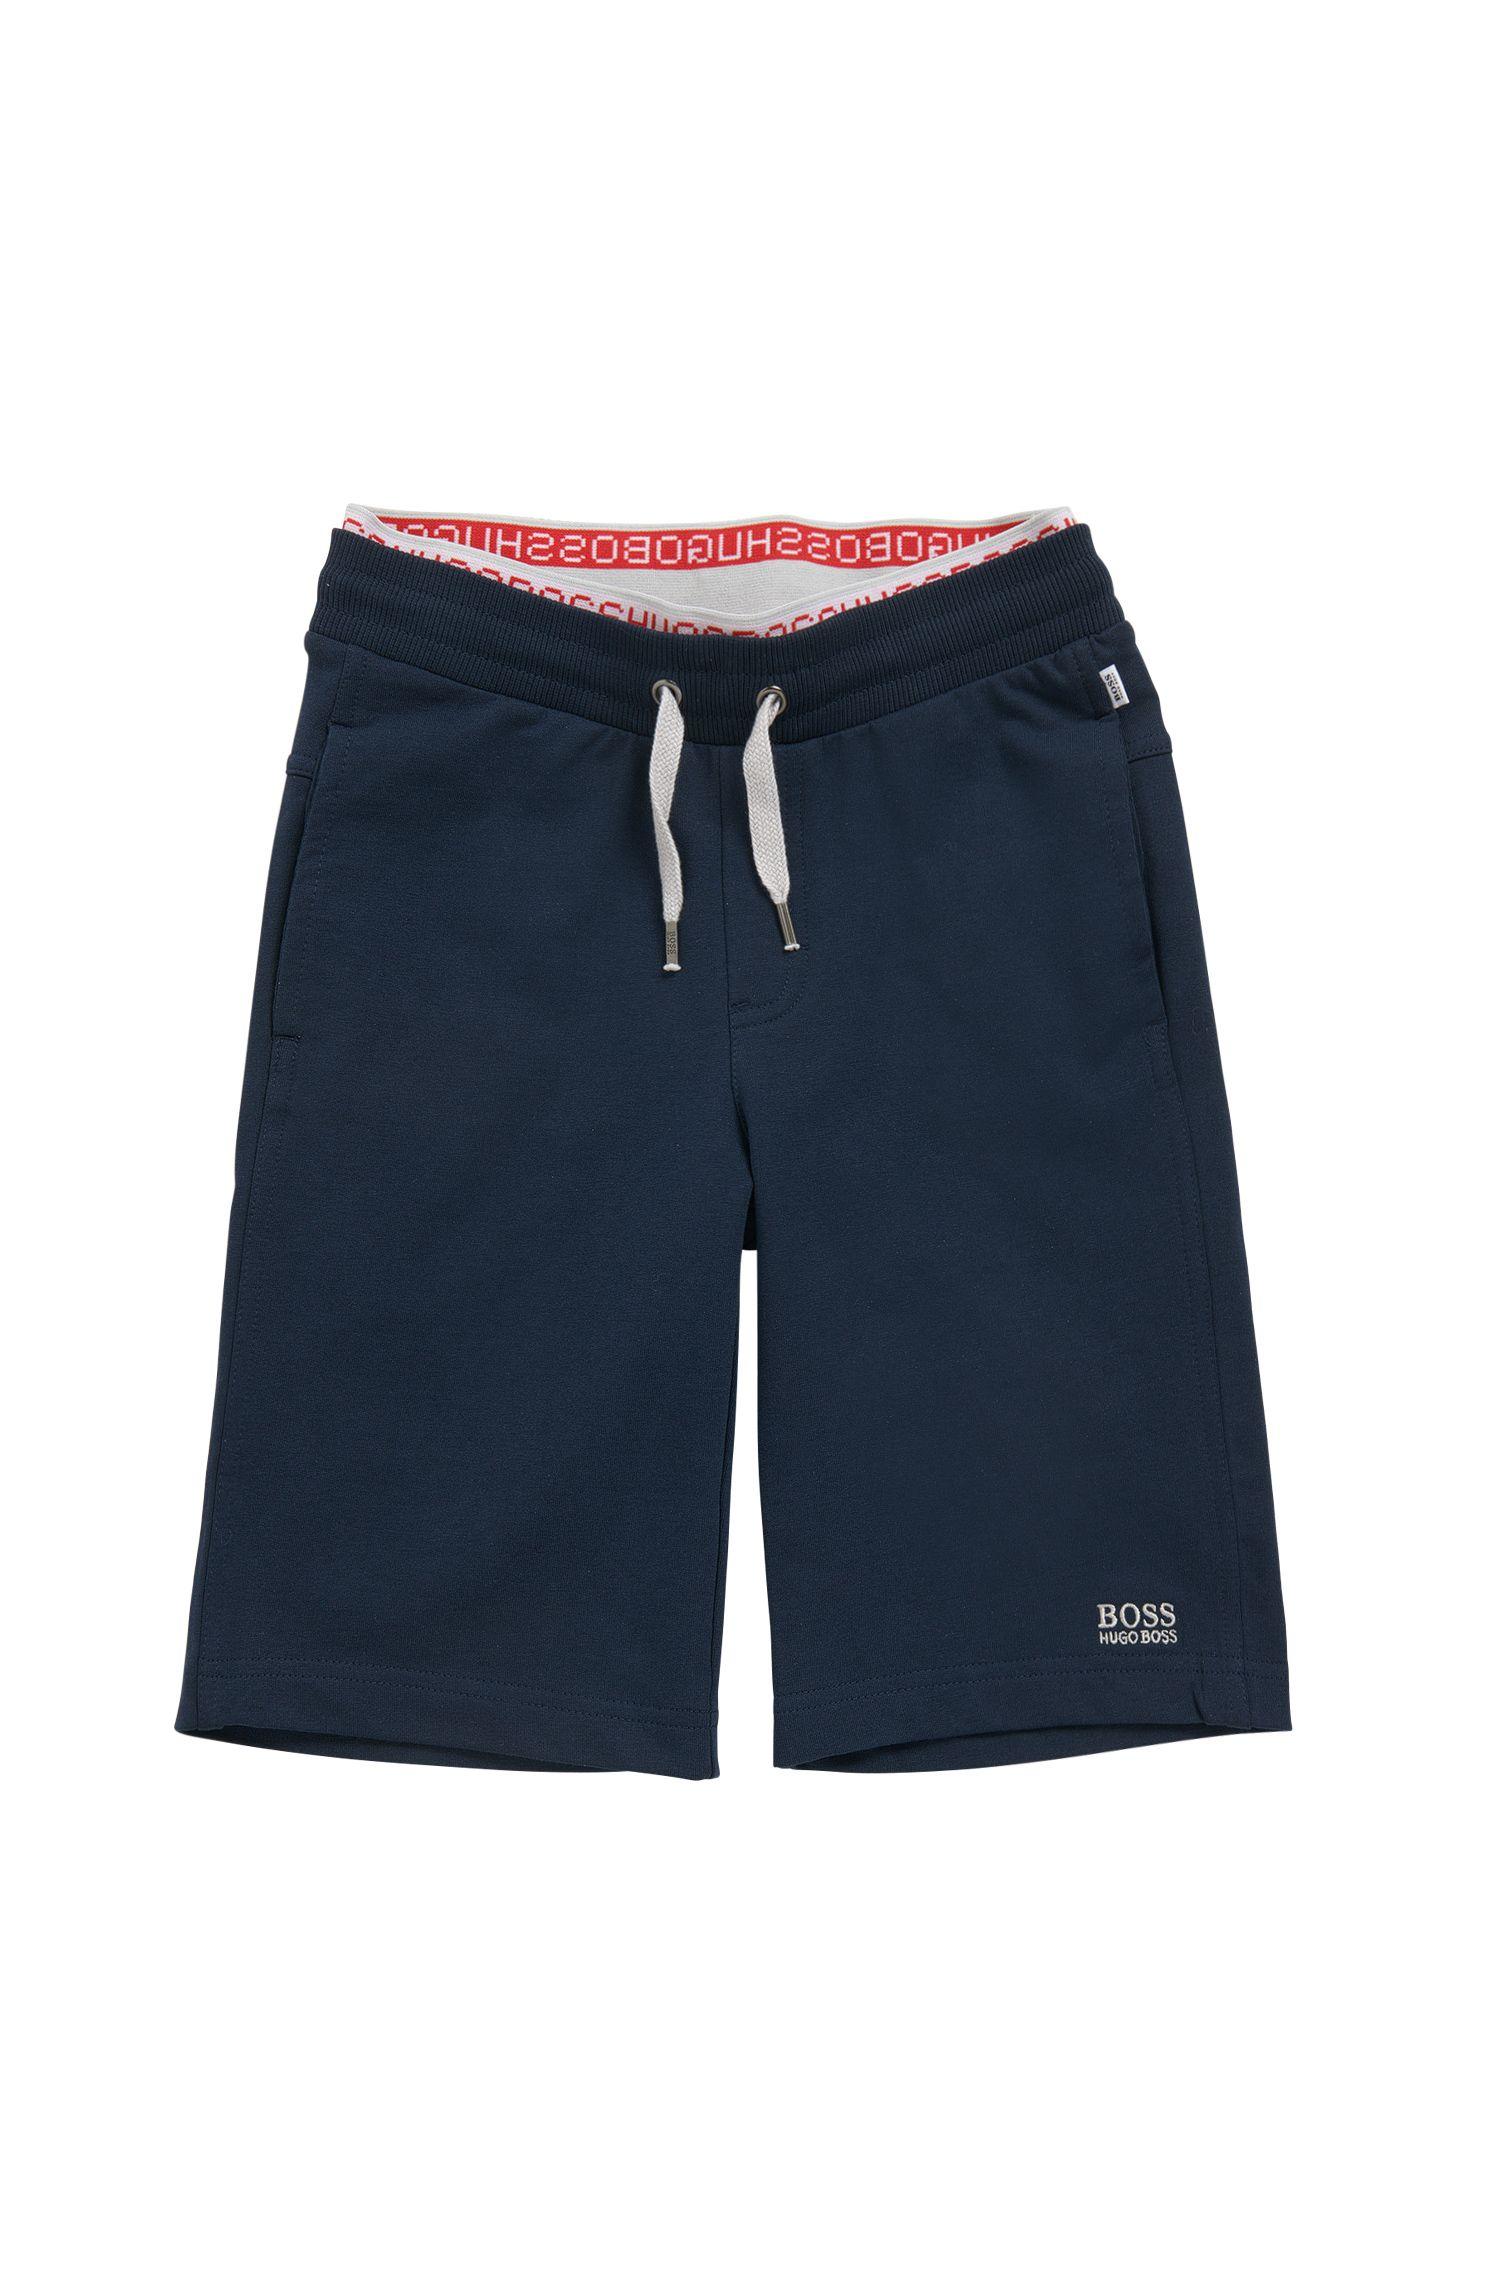 Pantalon molletonné pour enfant uni, en coton stretch: «J24384»